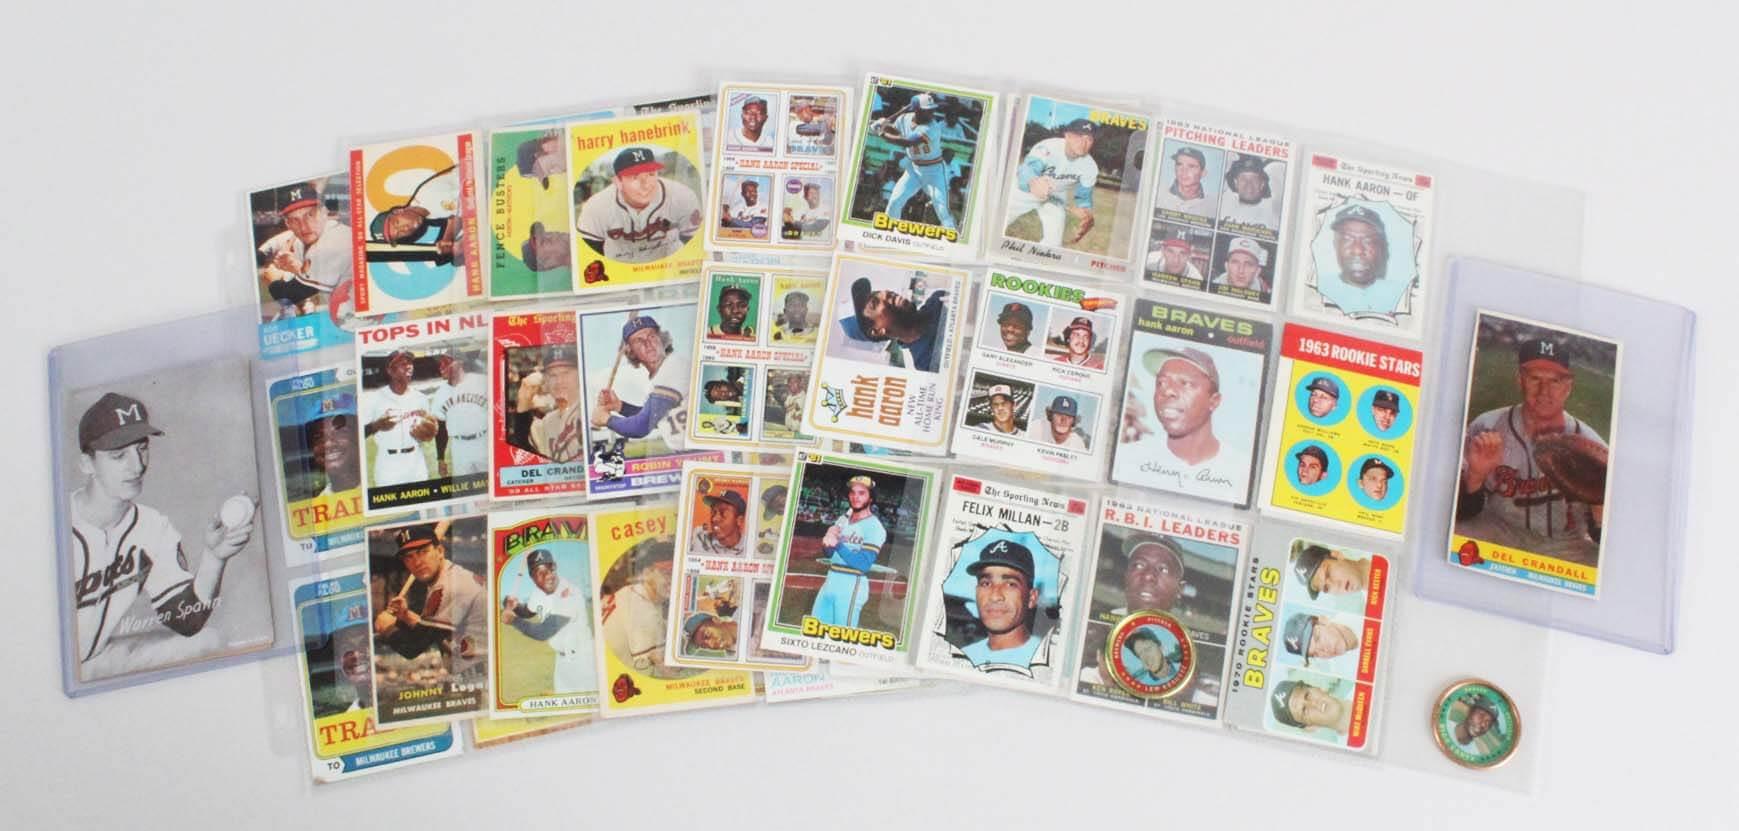 Milwaukee Brewers Atlanta Braves Baseball Card Lot (65) - Hank Aaron, Robin Yount, etc.